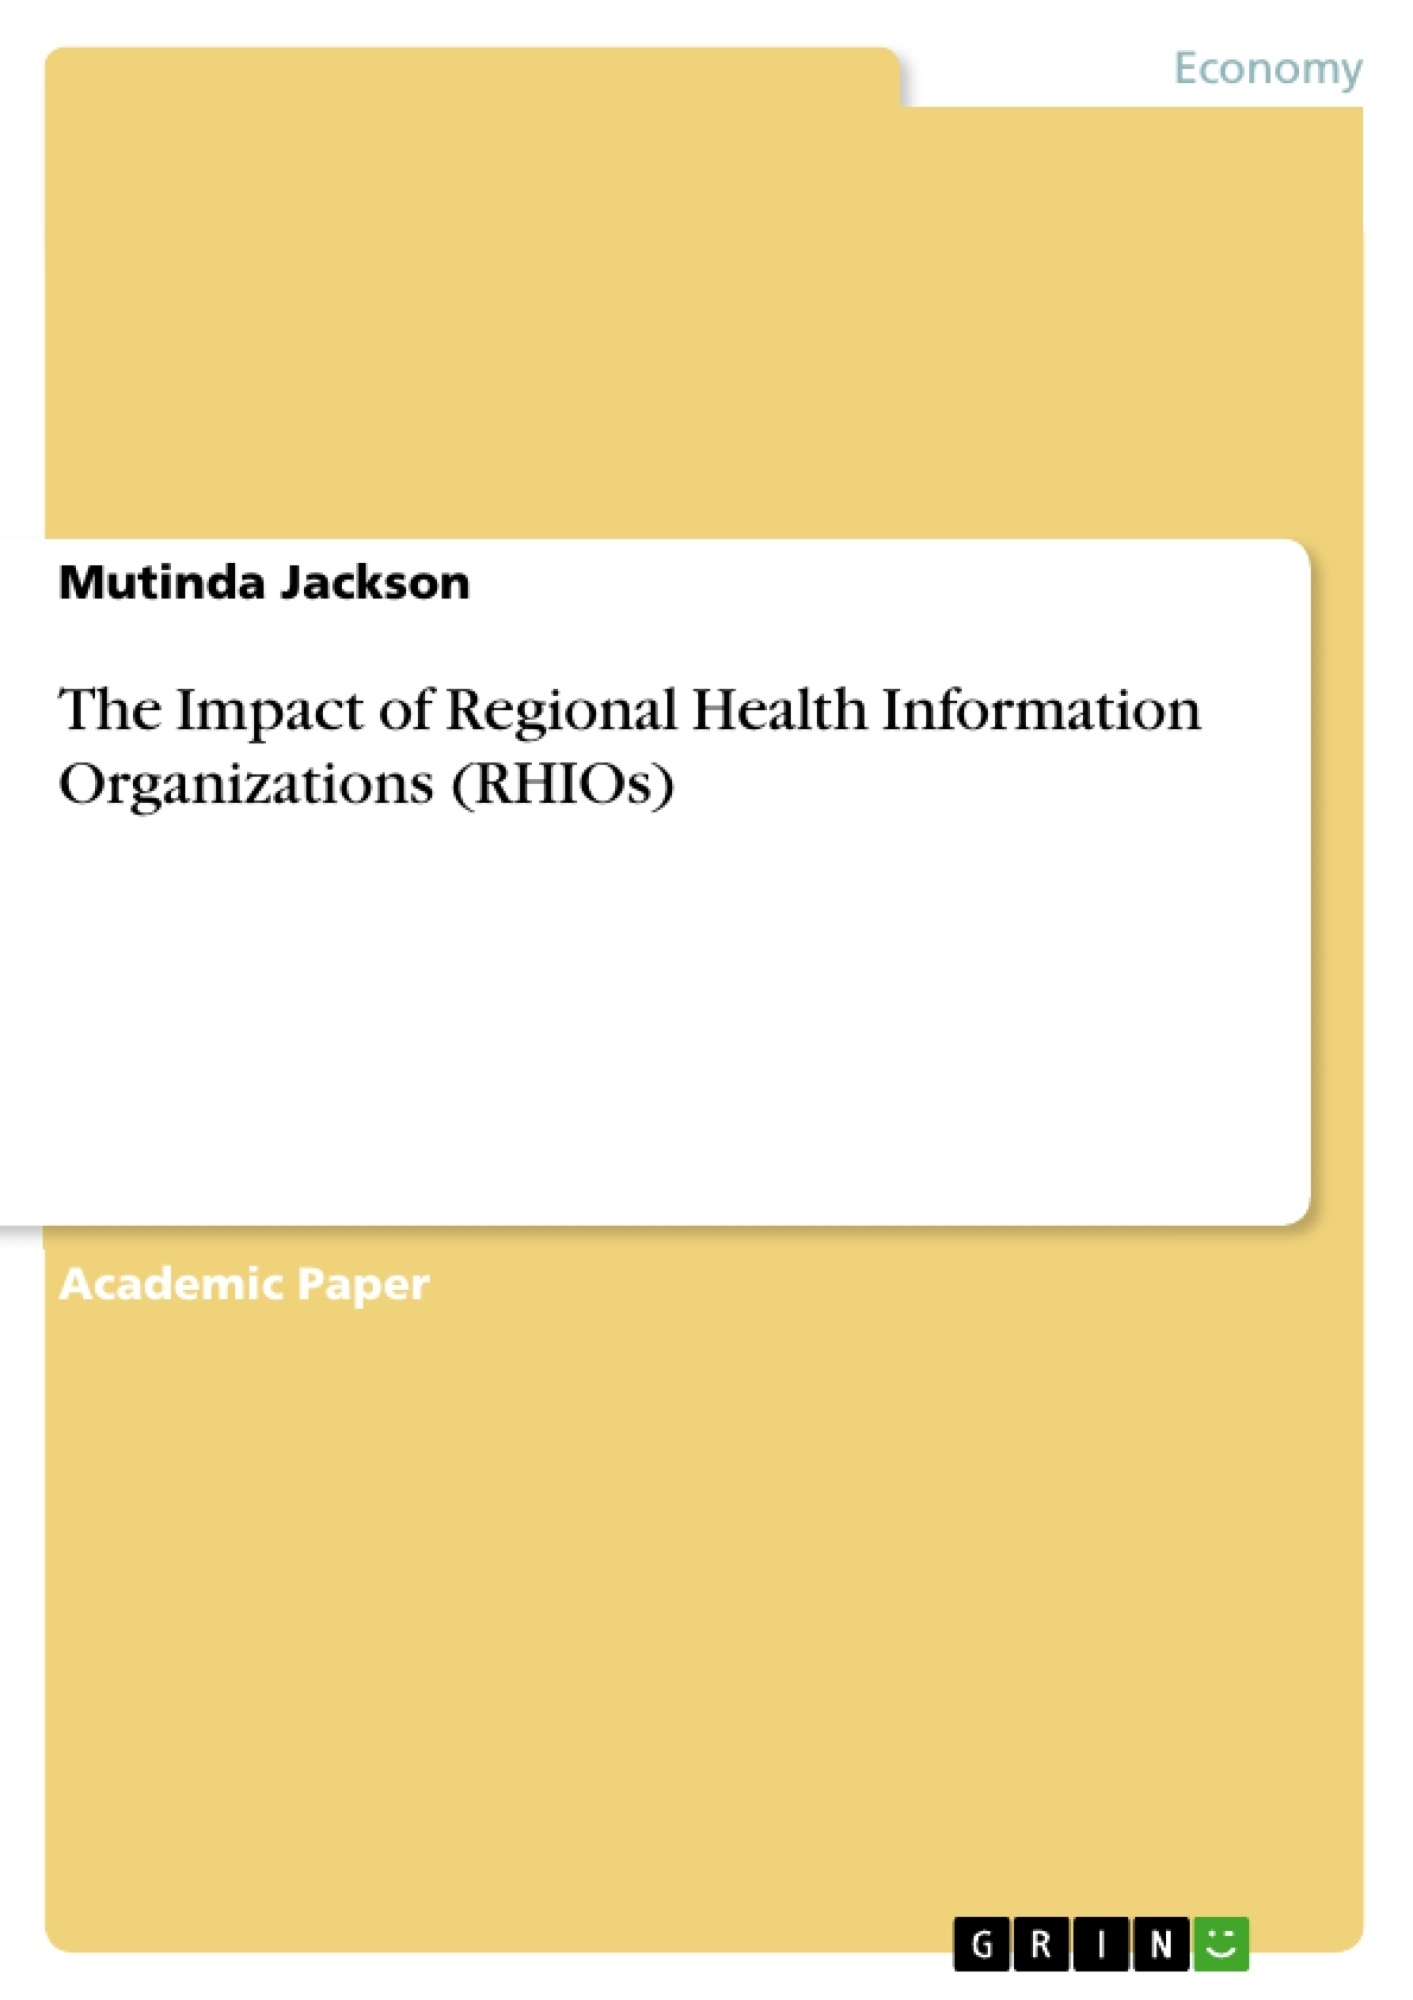 Title: The Impact of Regional Health Information Organizations (RHIOs)